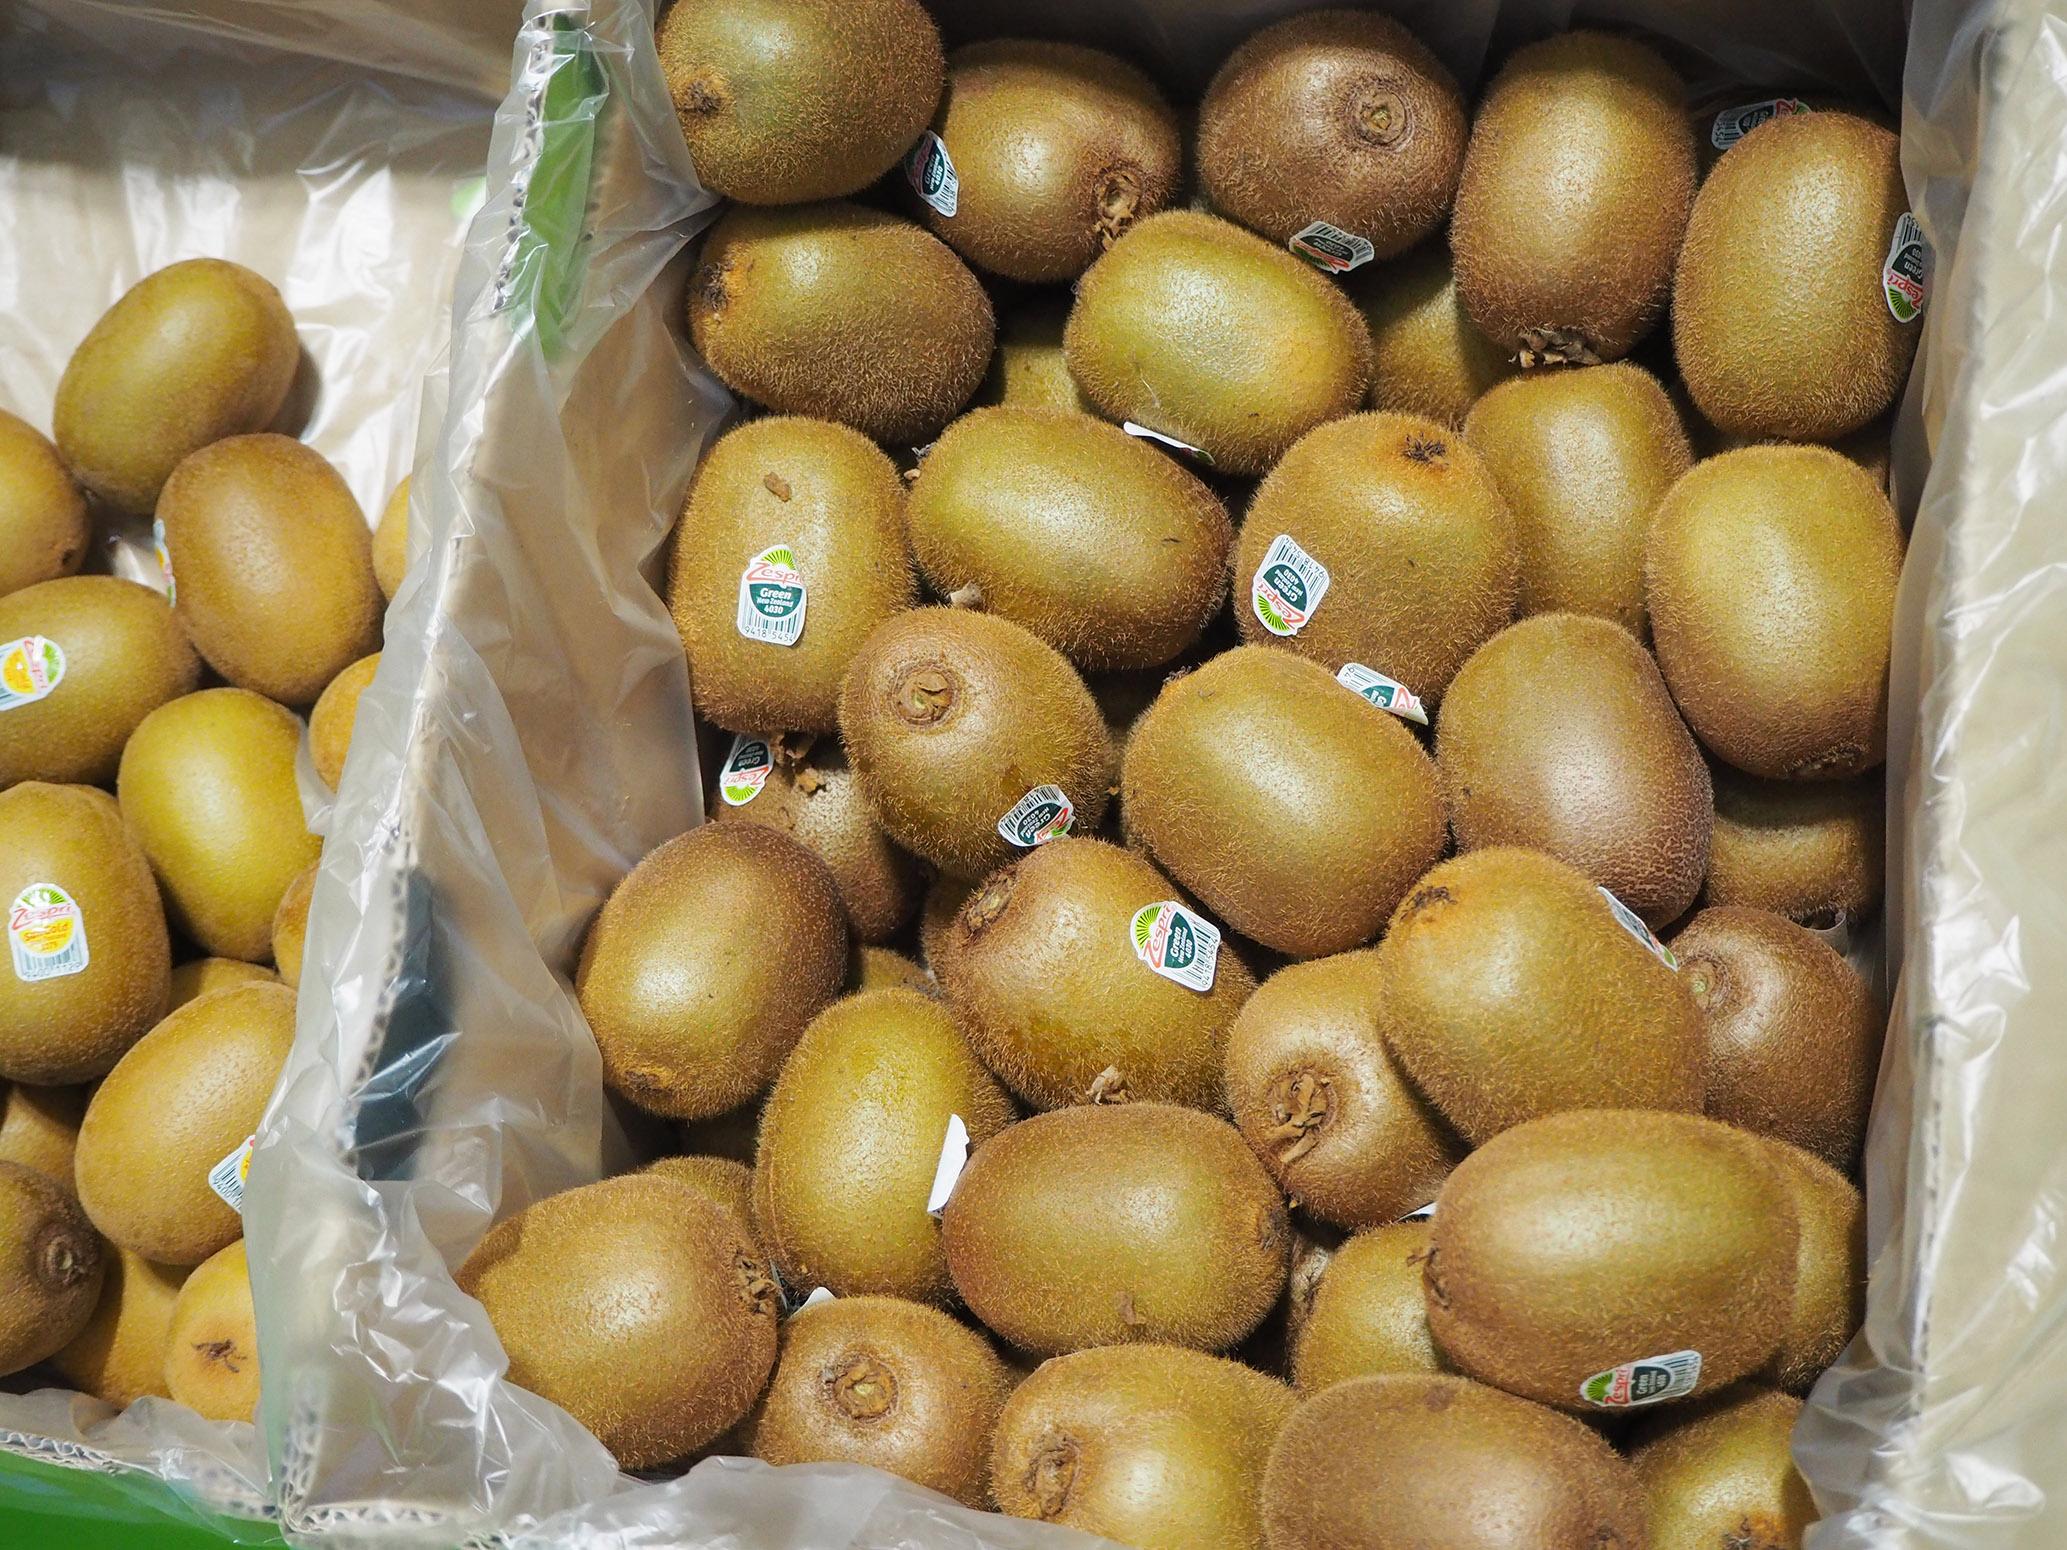 Zespri's kiwifruit at Fruit Attraction 2019 (ct. Alexandra Sautois, Eurofresh)